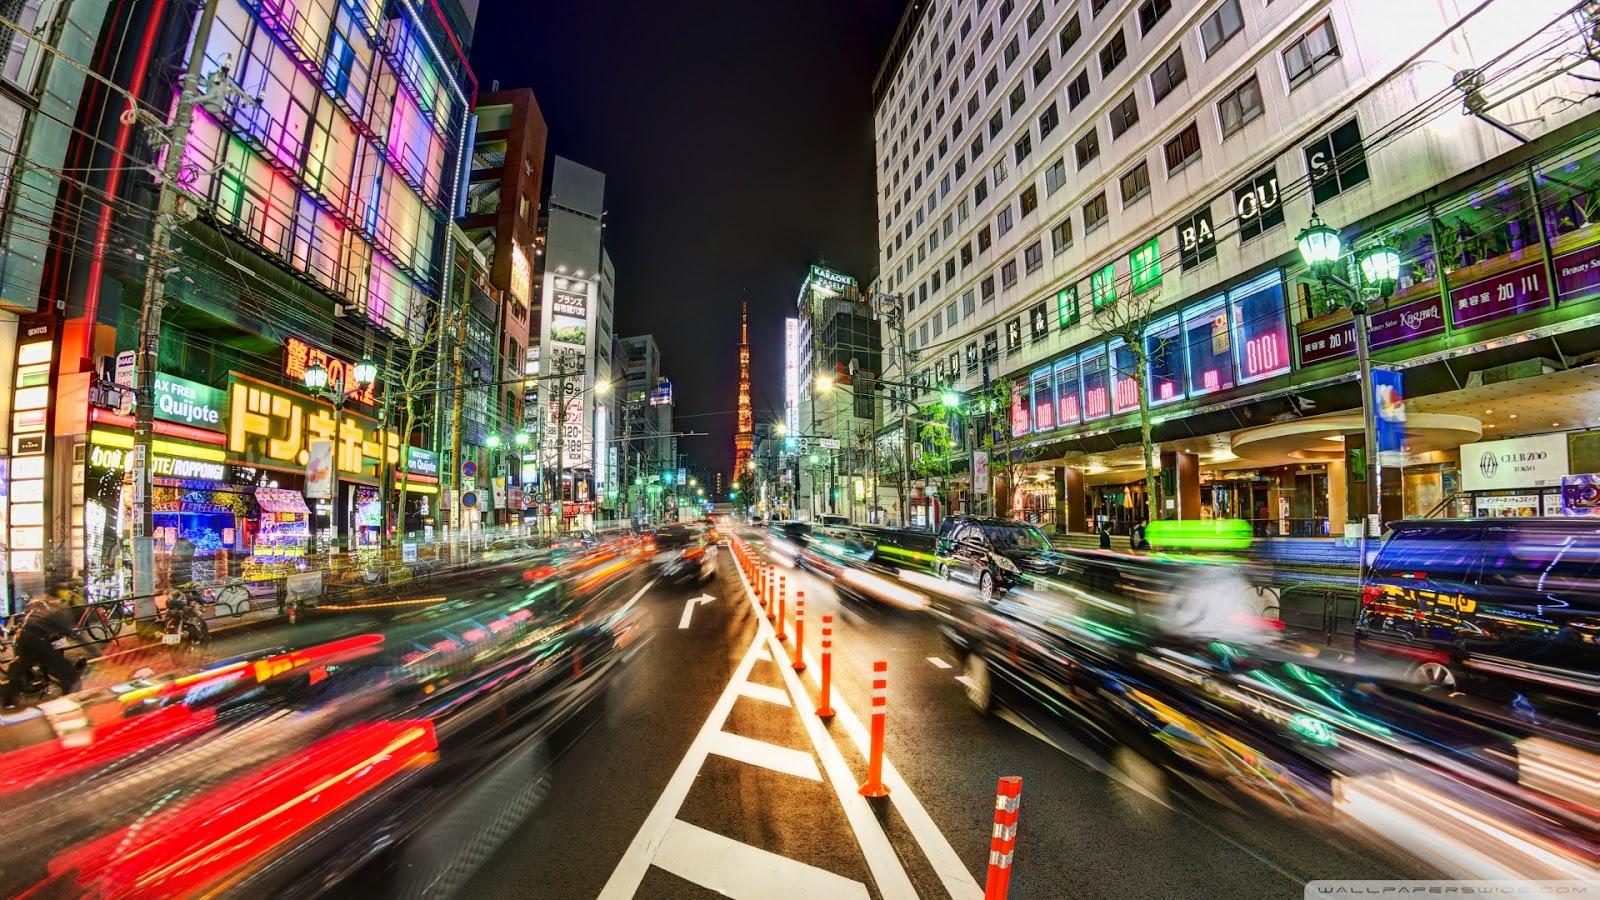 1366x768px <b>Top Tokyo Wallpaper</b> images 83 #1459208705